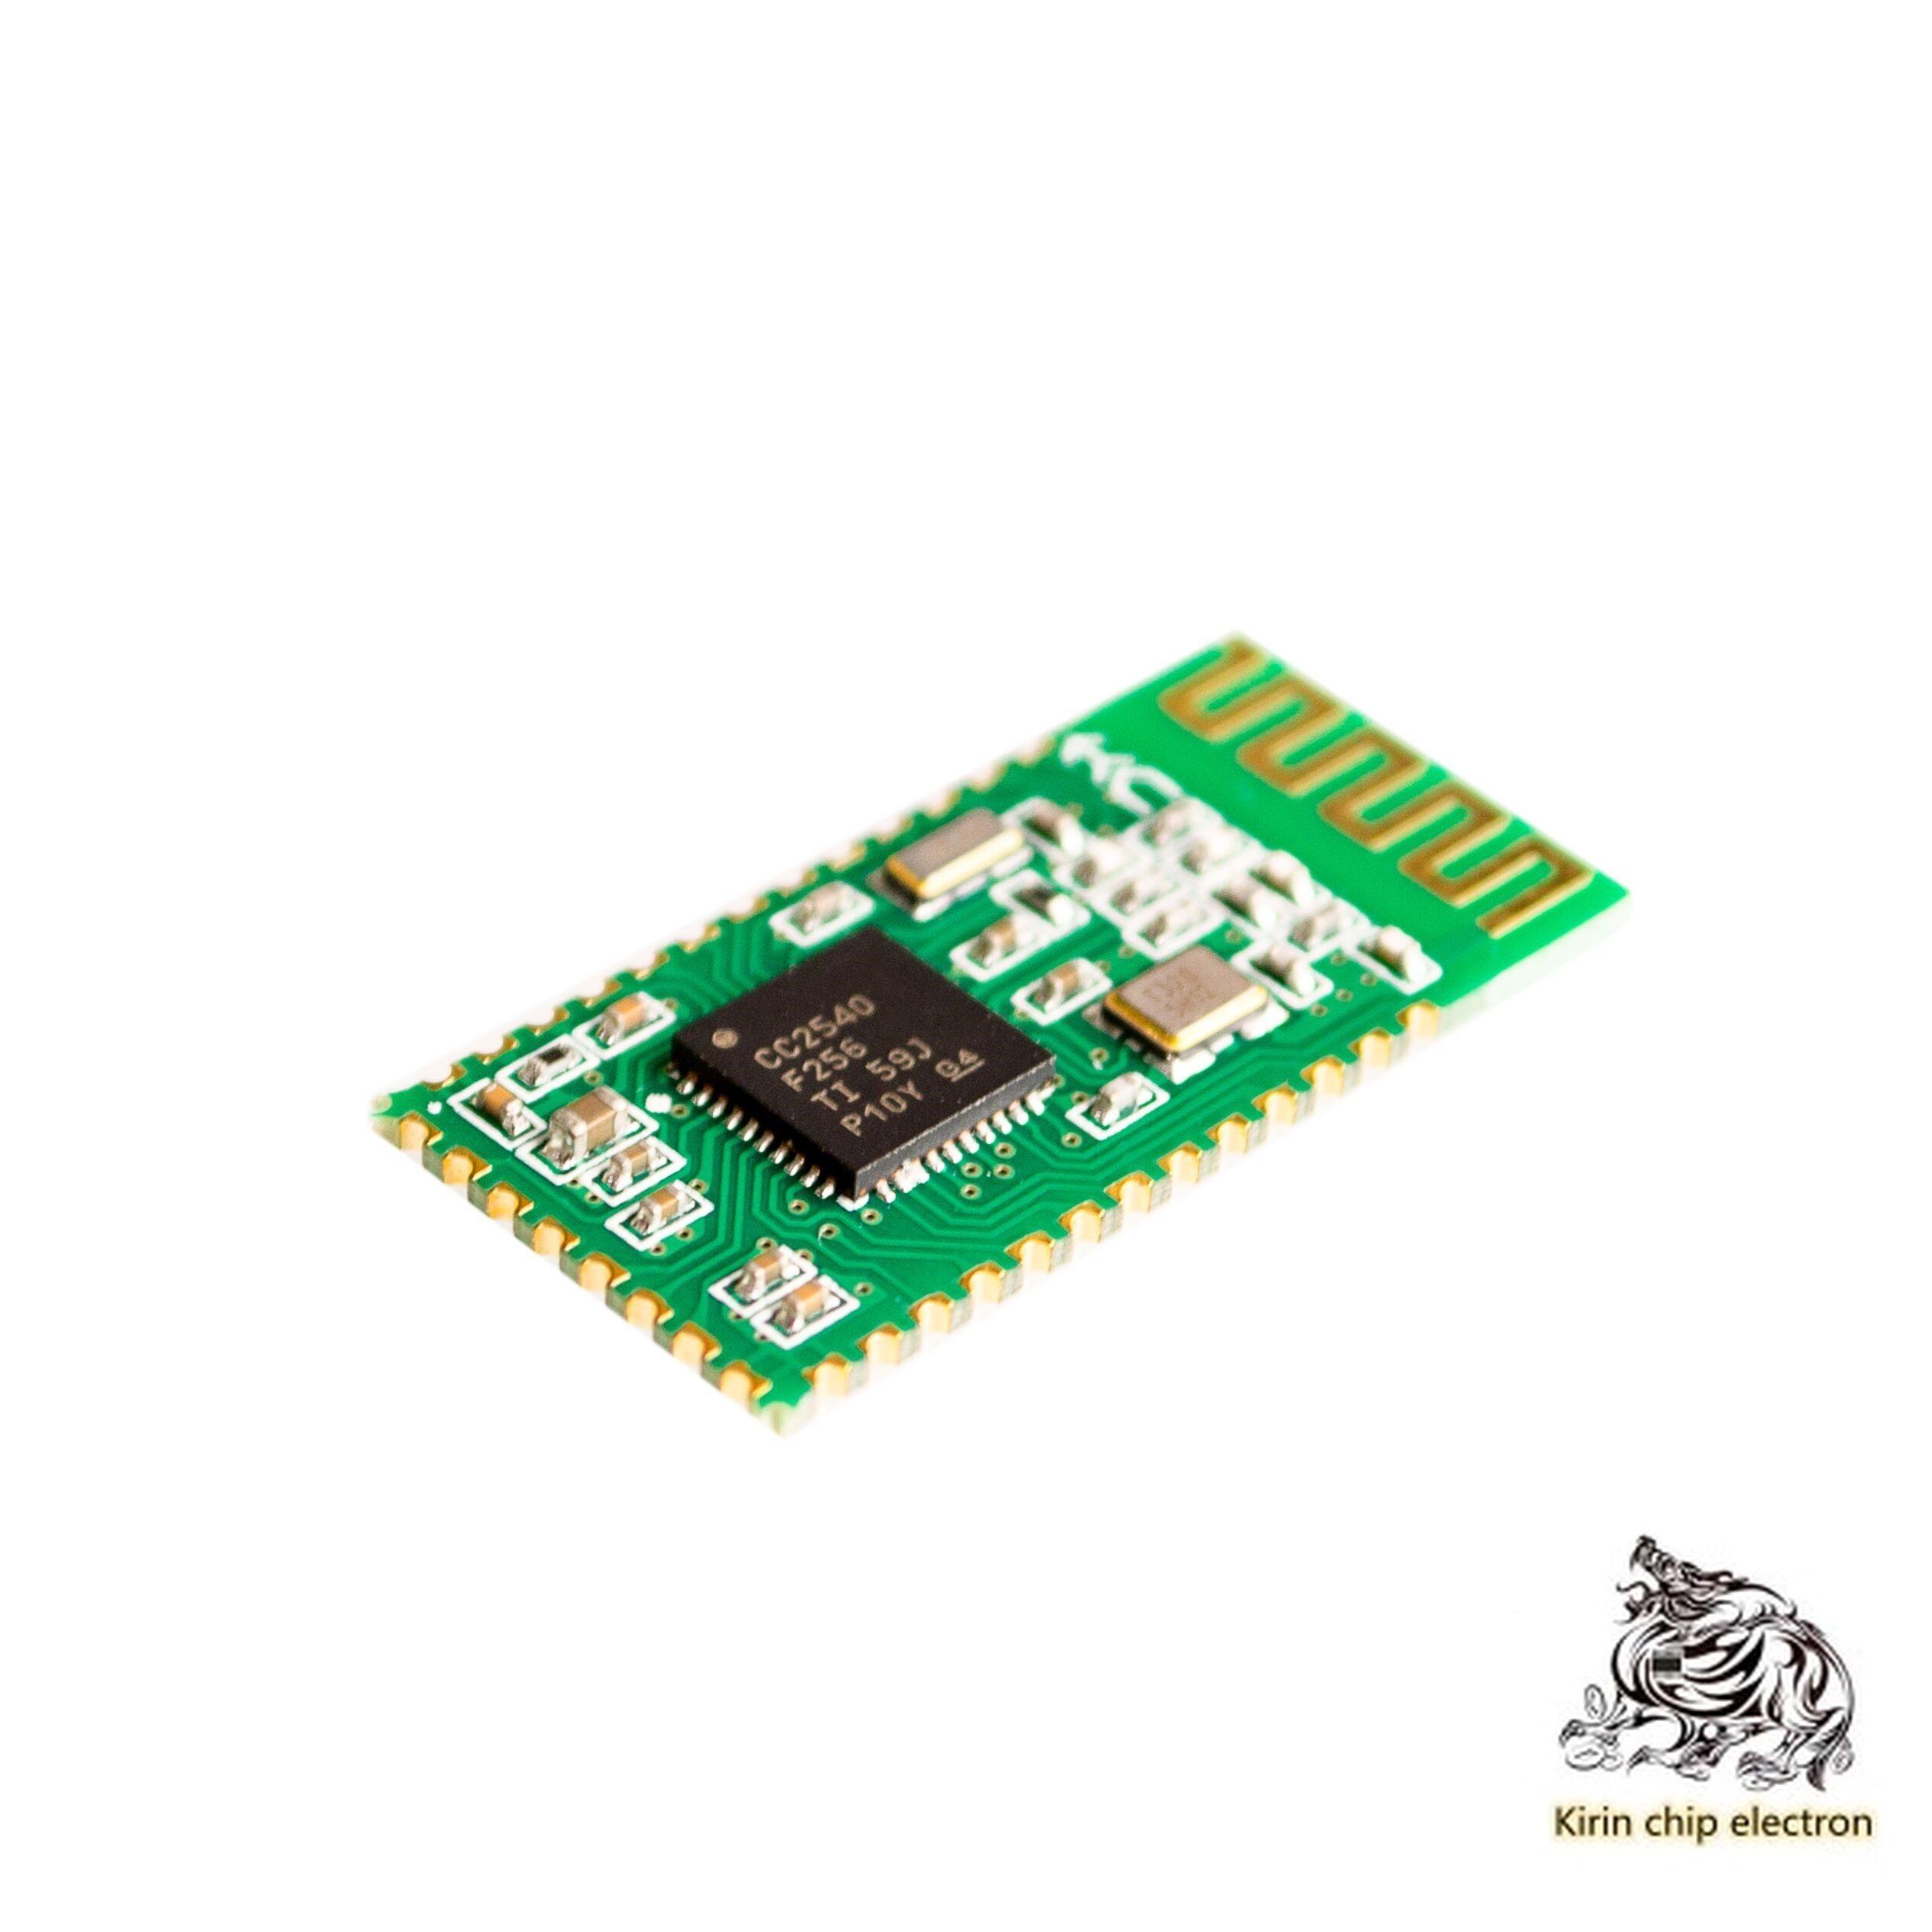 5PCS/LOT HC-08 Bluetooth 4.0 Serial Port Module BLE Low Power Cc2540 Apple Android Master-slave Spp